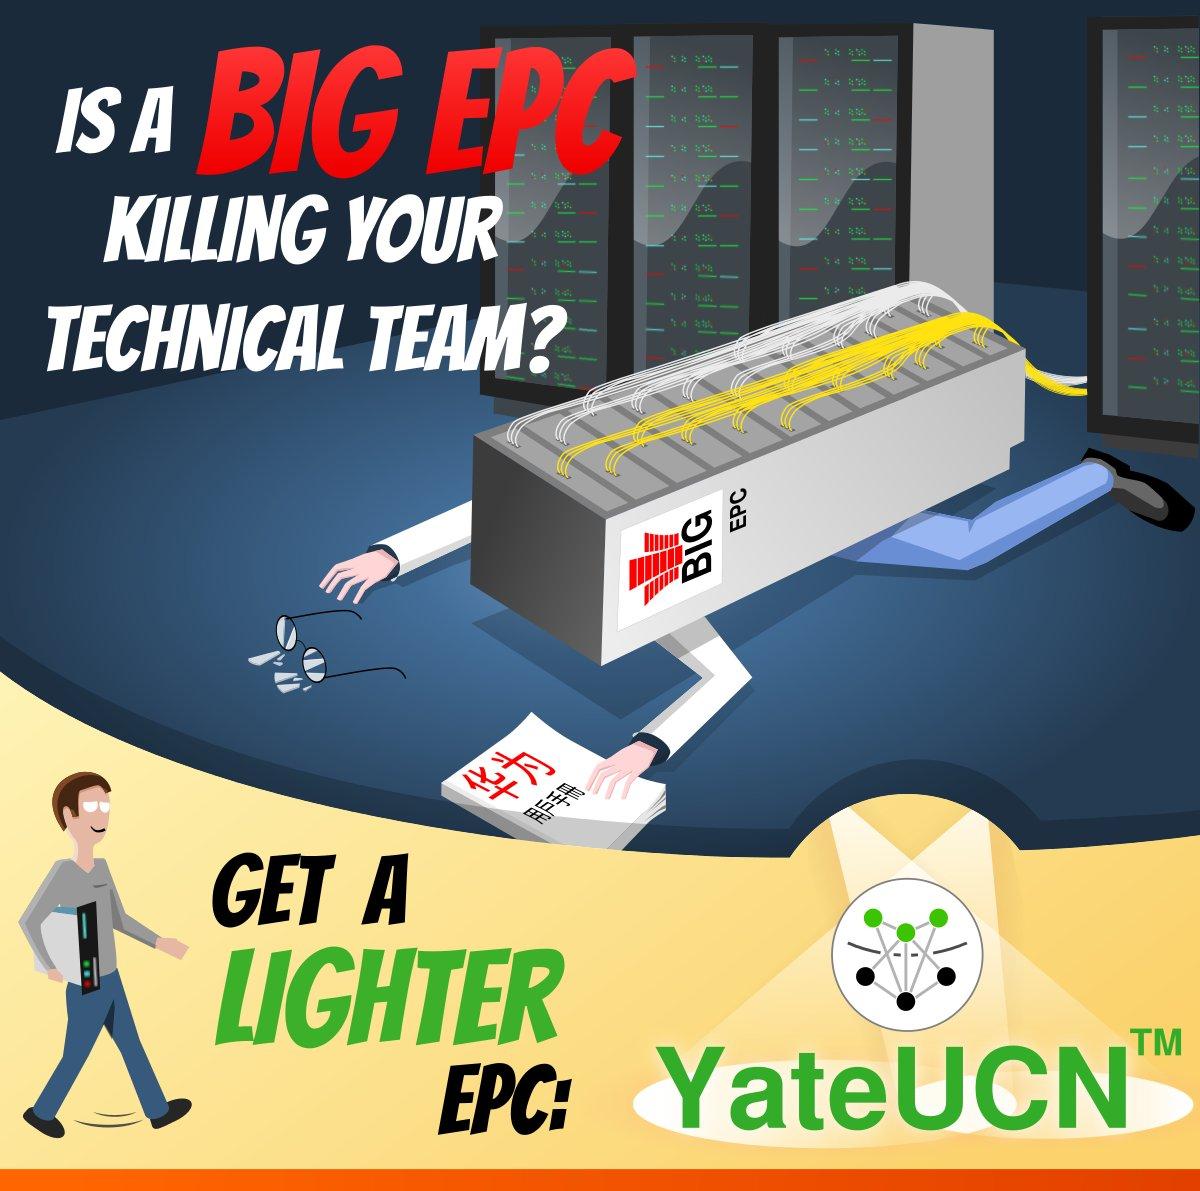 yateucn hashtag on Twitter